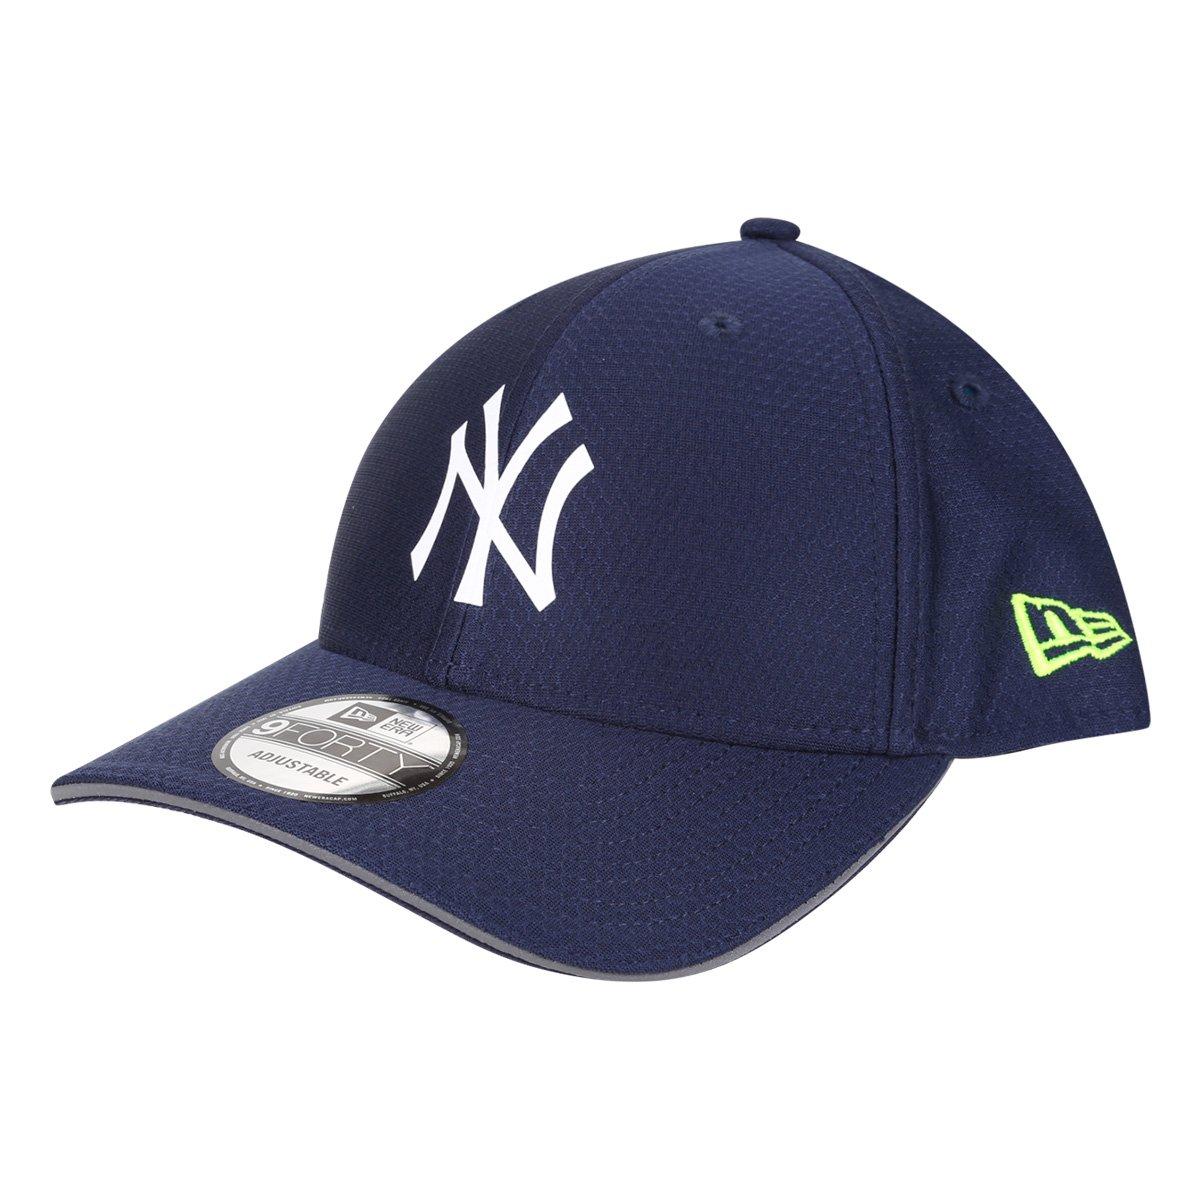 Boné New Era MLB New York Yankees Aba Curva Snapback Urban Tech Reflective Flap 9Forty